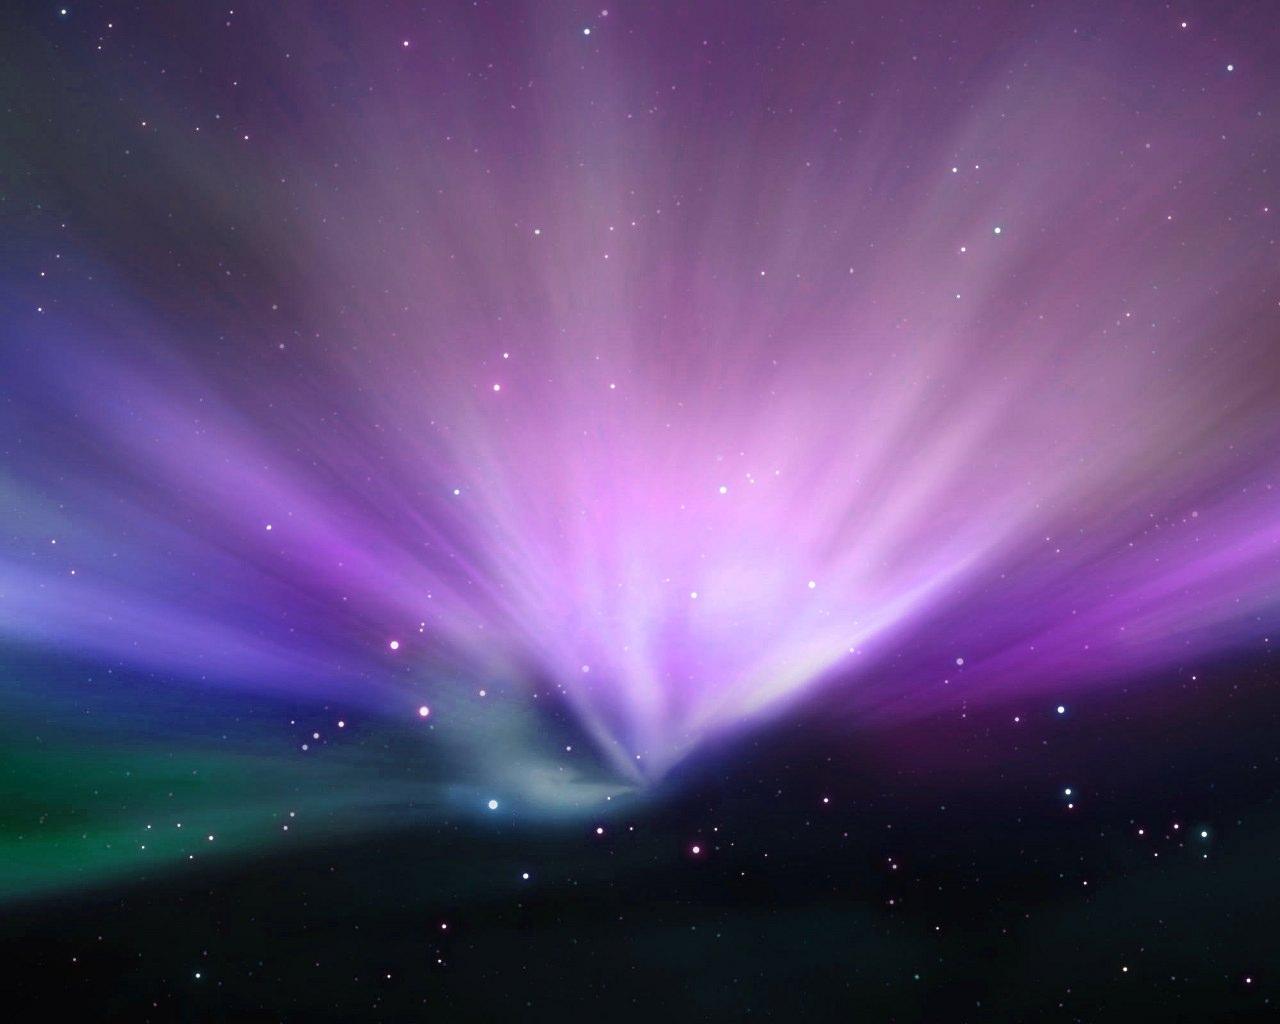 http://4.bp.blogspot.com/_2UbsSBz9ckE/TEHqN591SHI/AAAAAAAABR4/_hvYzk73fqA/s1600/aurora+mac13_1280x1024.jpg